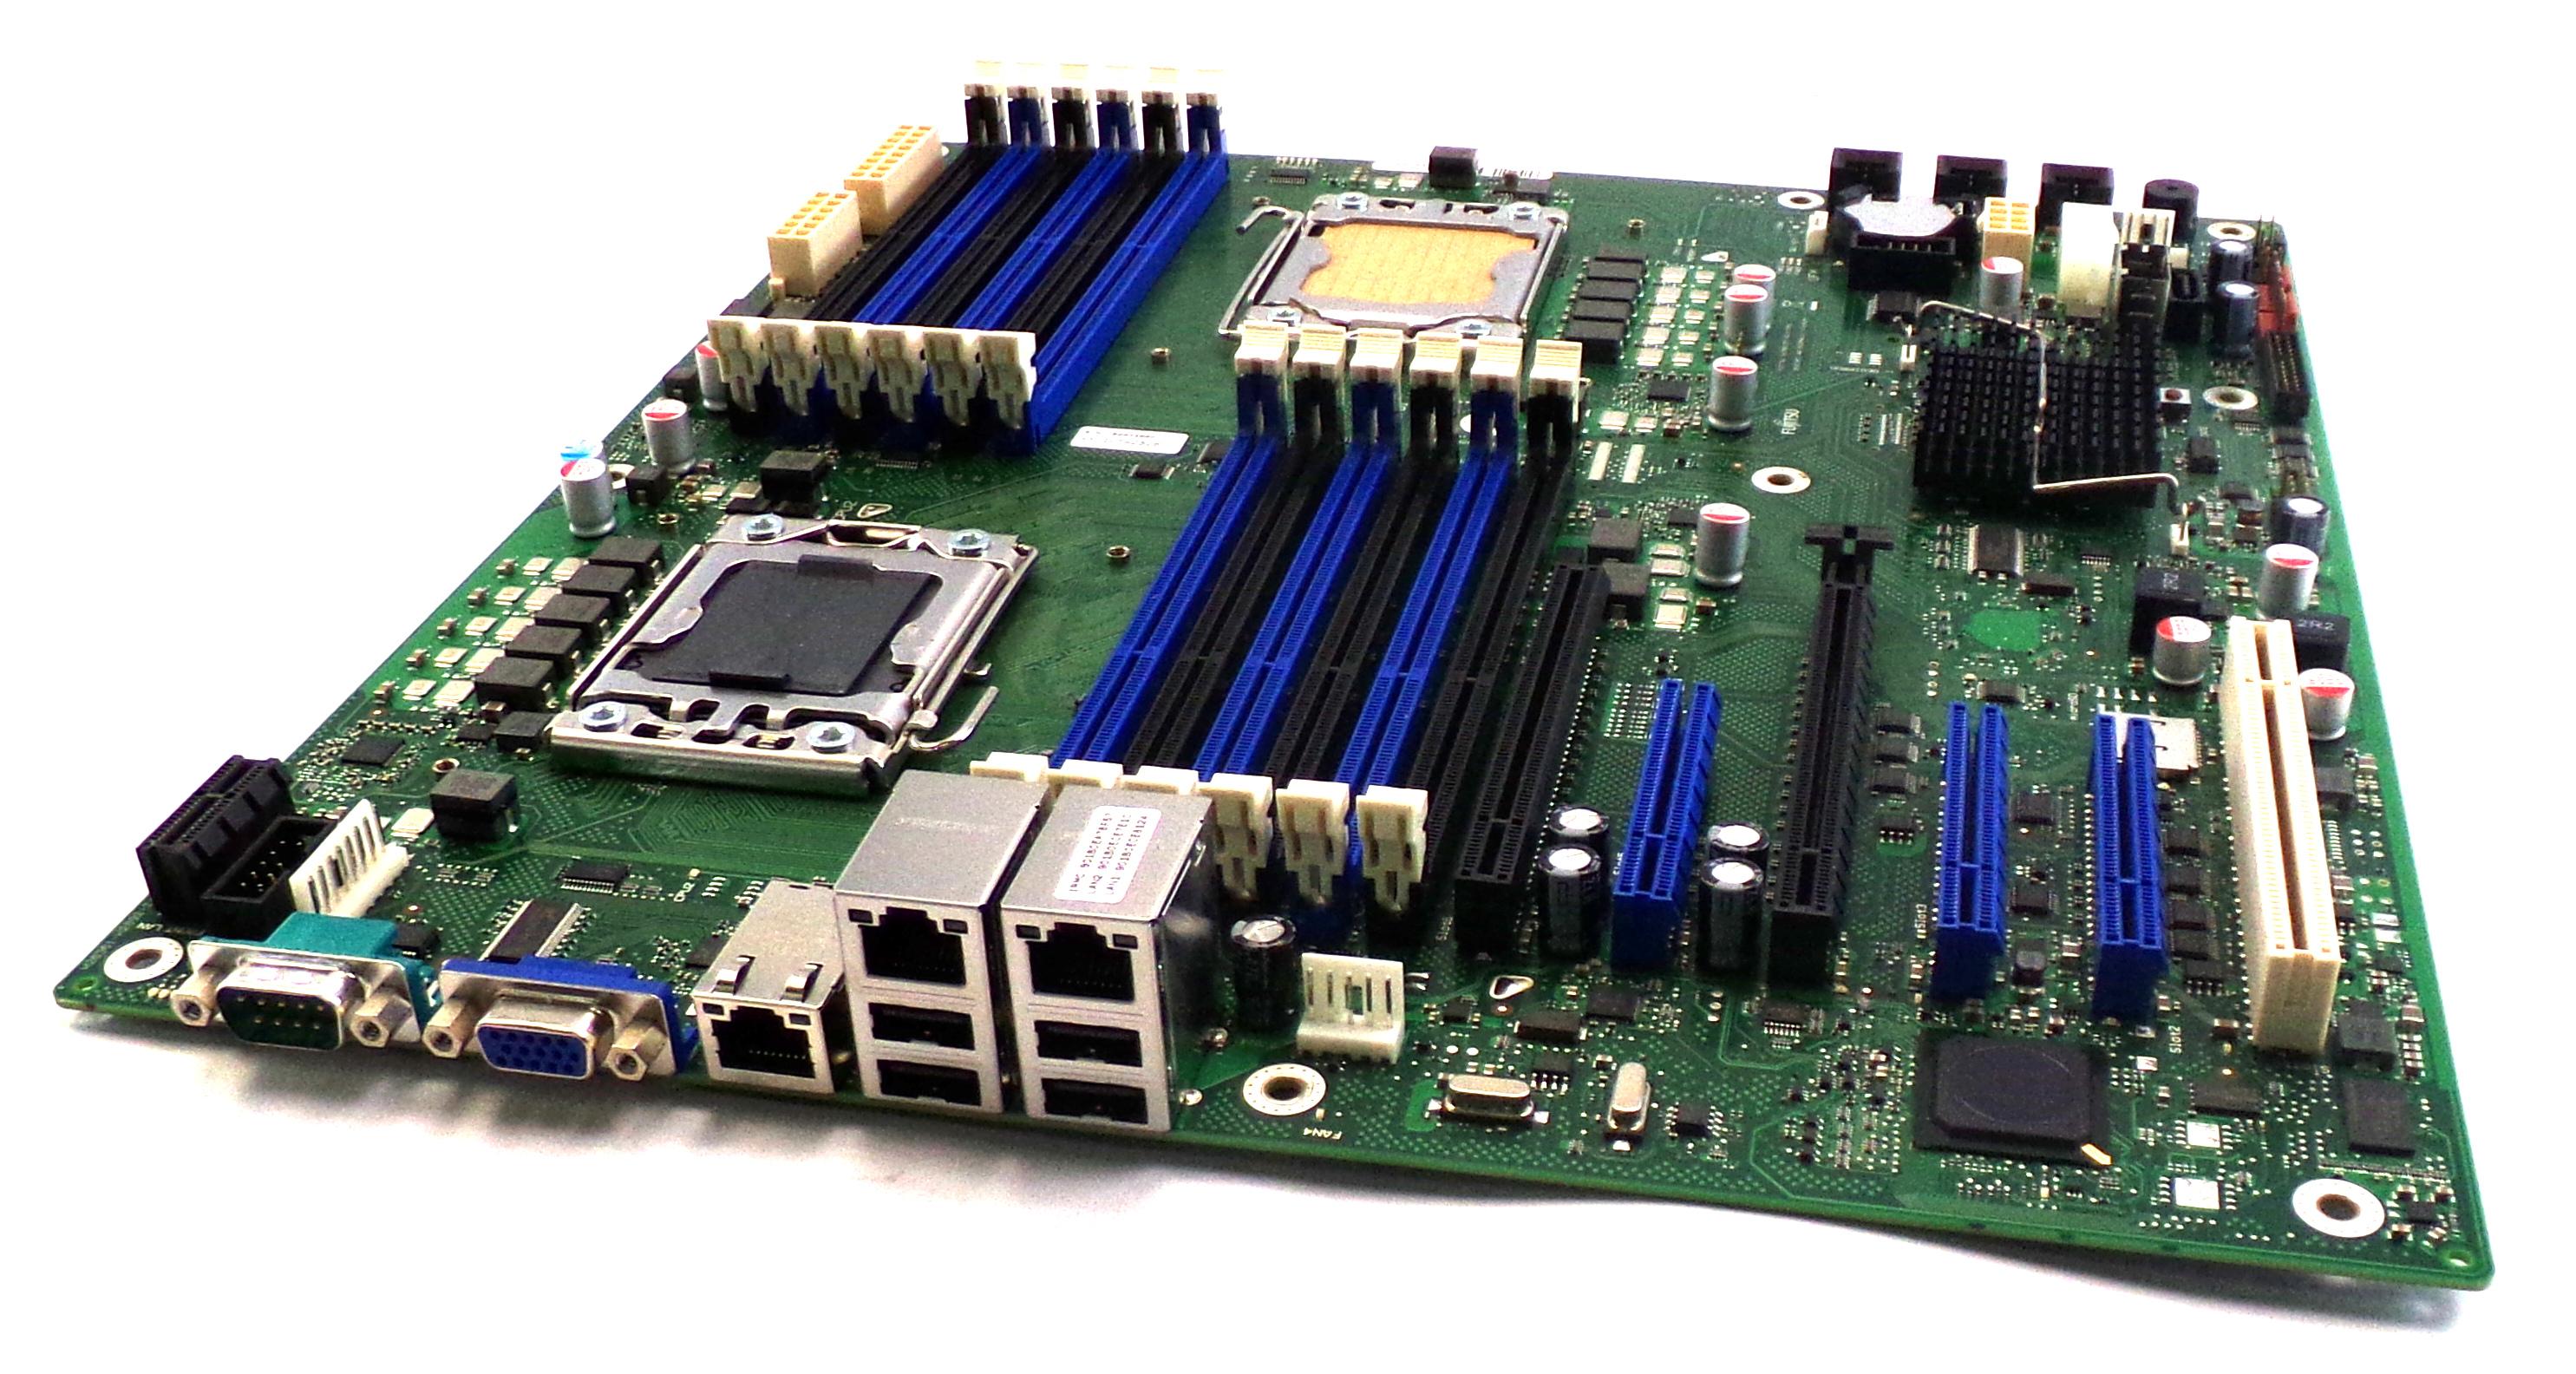 Fujitsu D3099-B12 Primergy TX2540 M1 Socket LGA1356 Server Motherboard